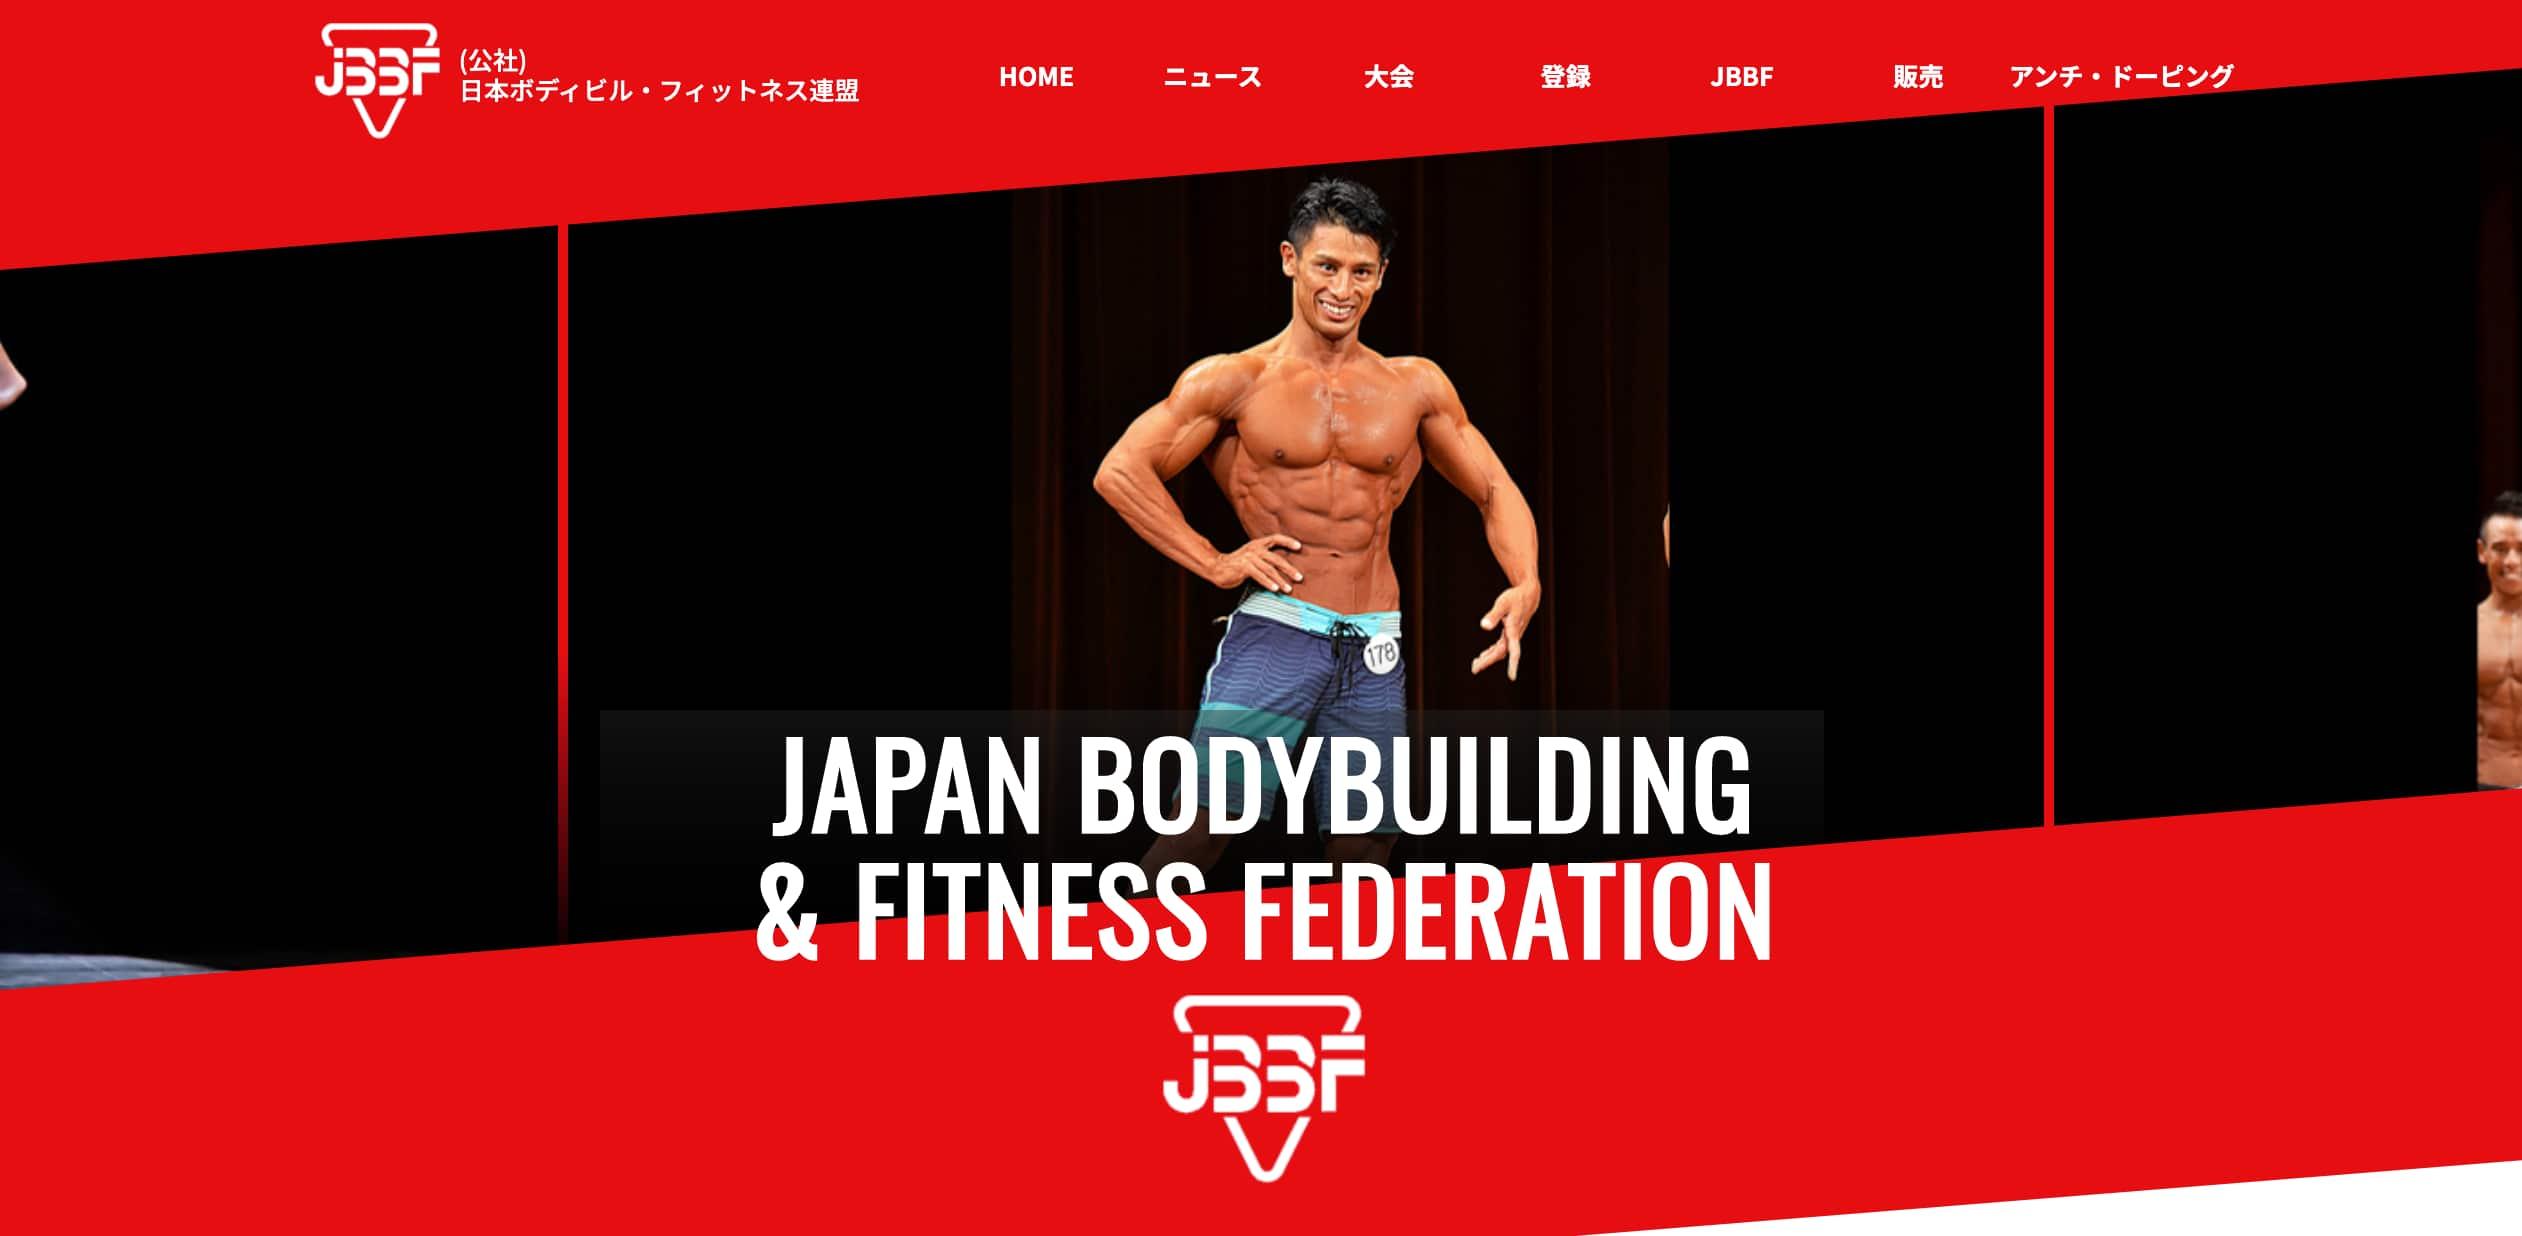 JBBF:日本ボディビル連盟